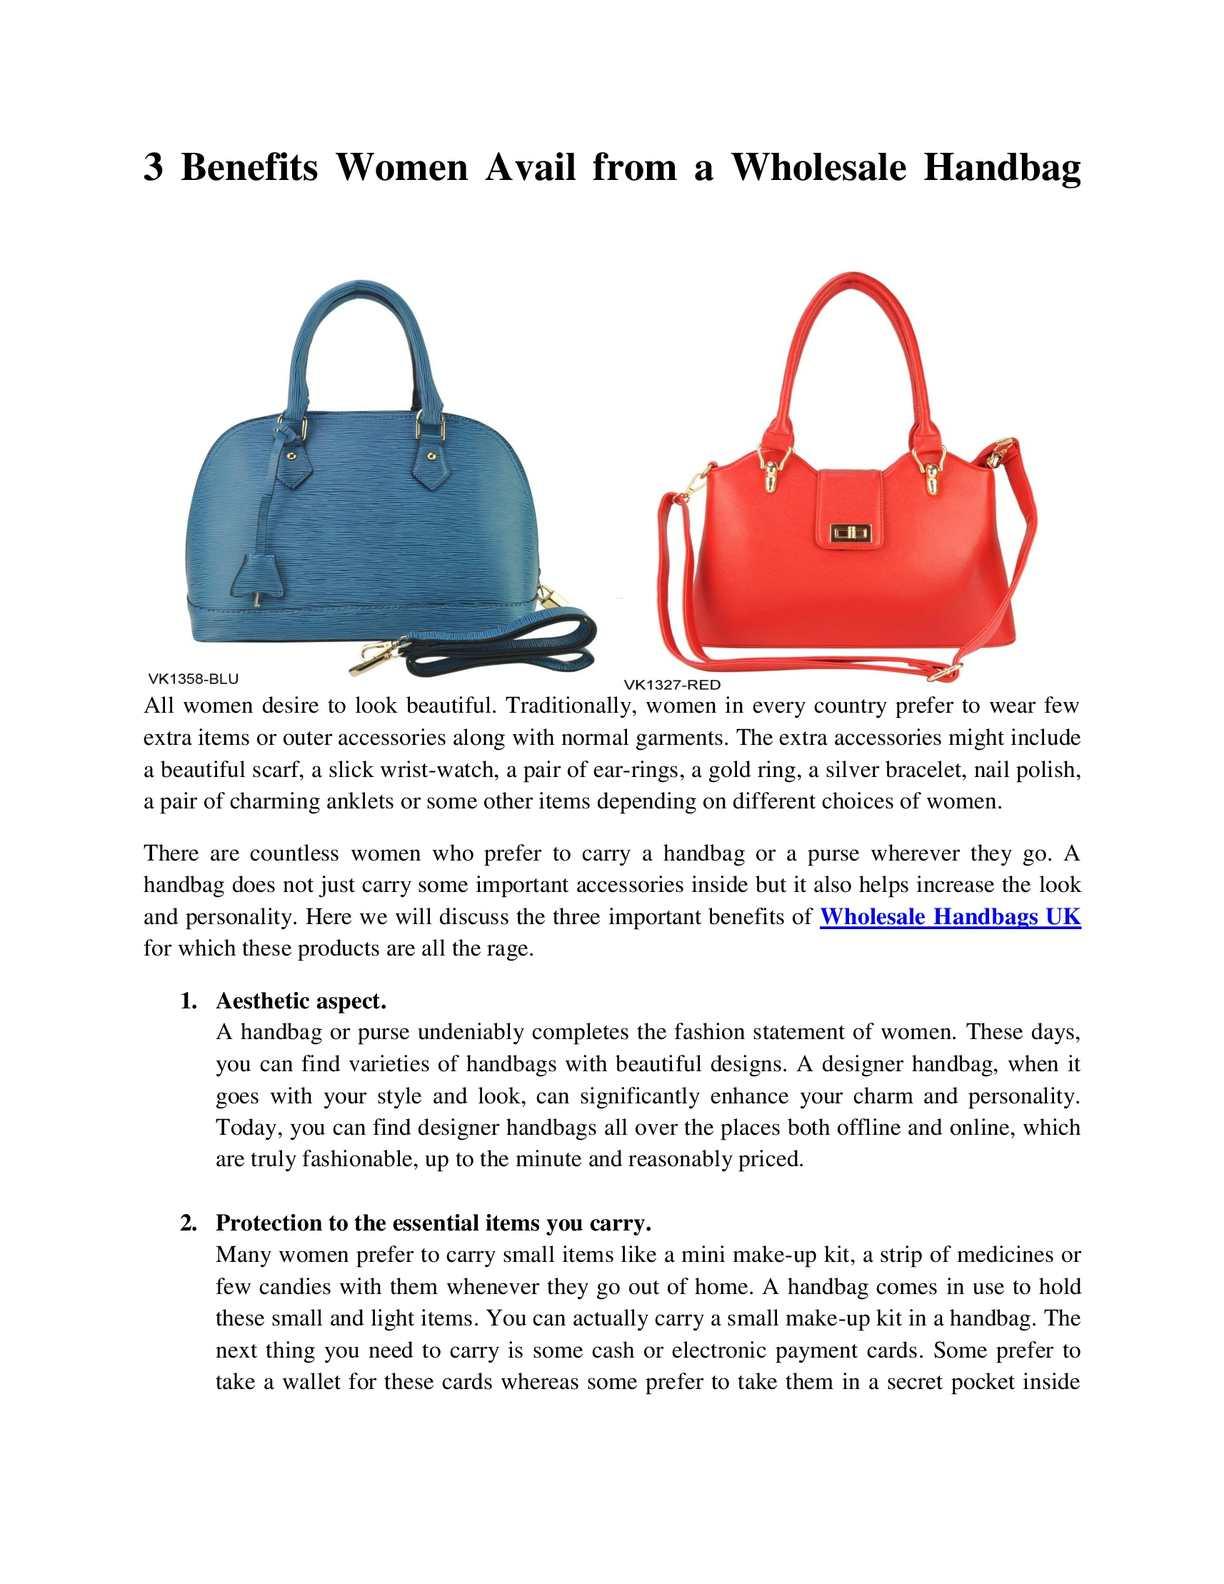 b24b76b79f4e Calaméo - 3 Benefits Women Avail from a Wholesale Handbags